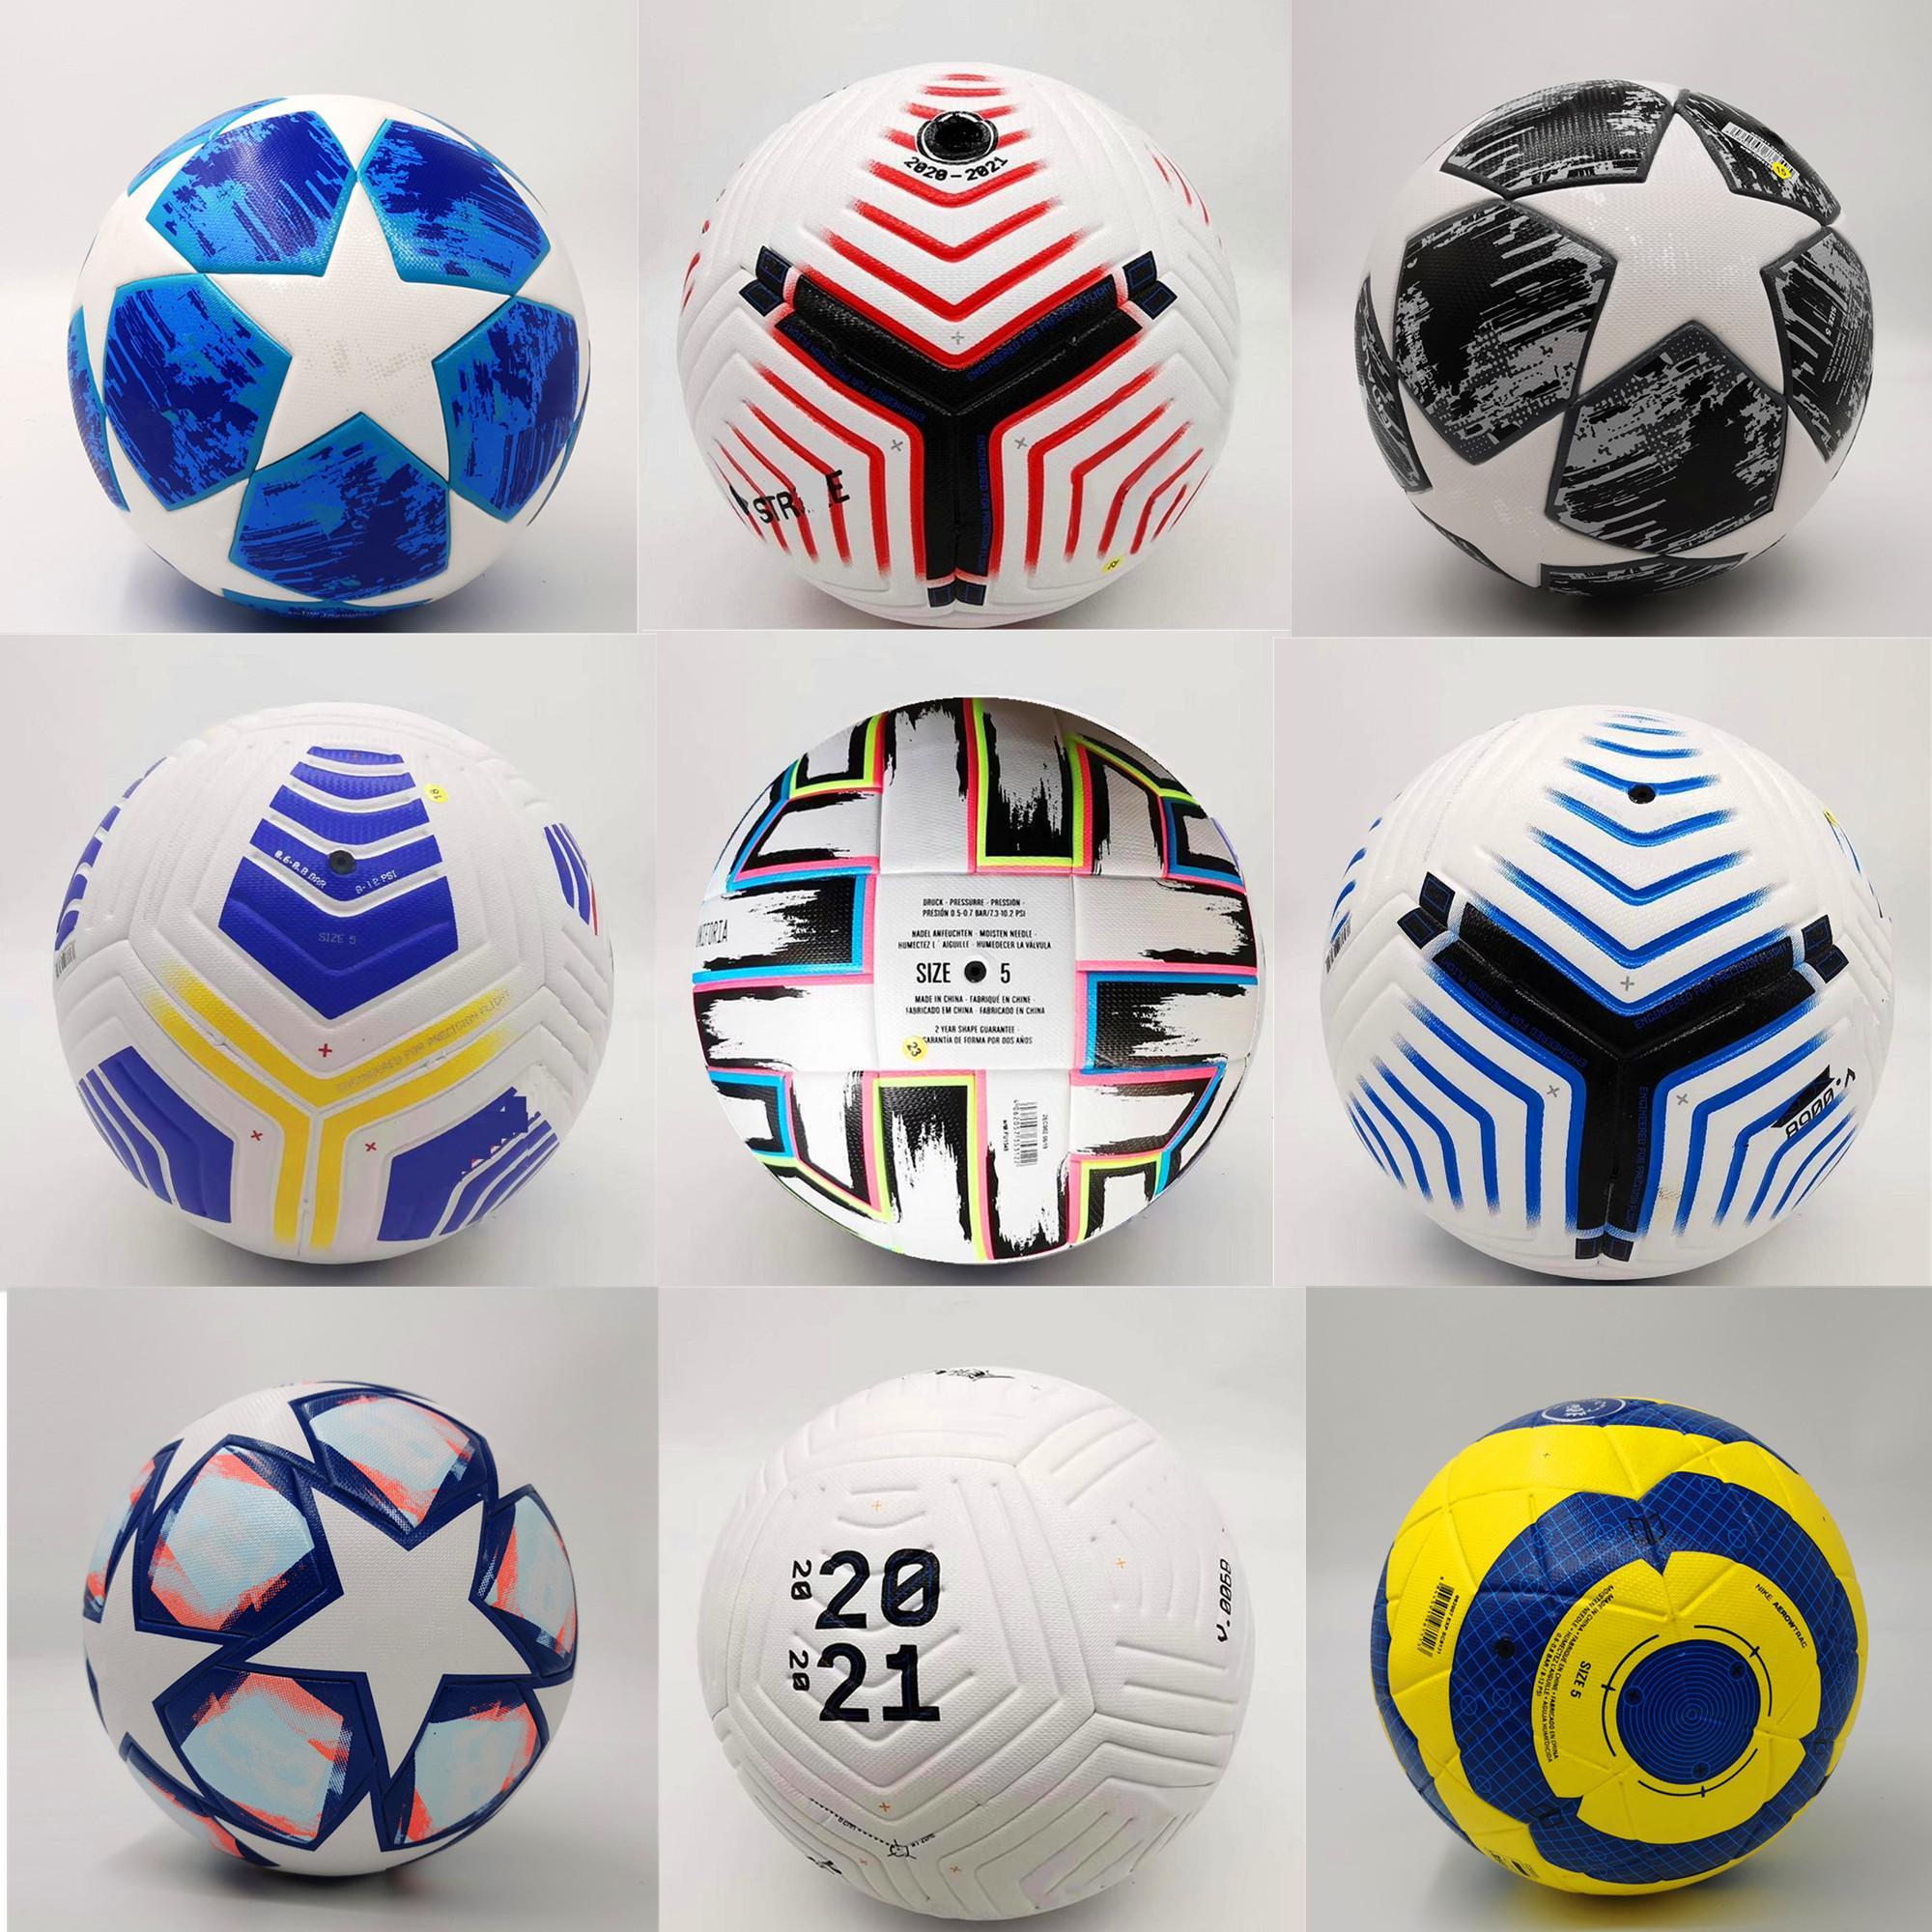 Premier League League كرة القدم UEFAS EURO 20 21 Kyiv Pu Size 5 2021 Serie A القطار المباراة الكبار حبيبات كرة القدم الخاصة